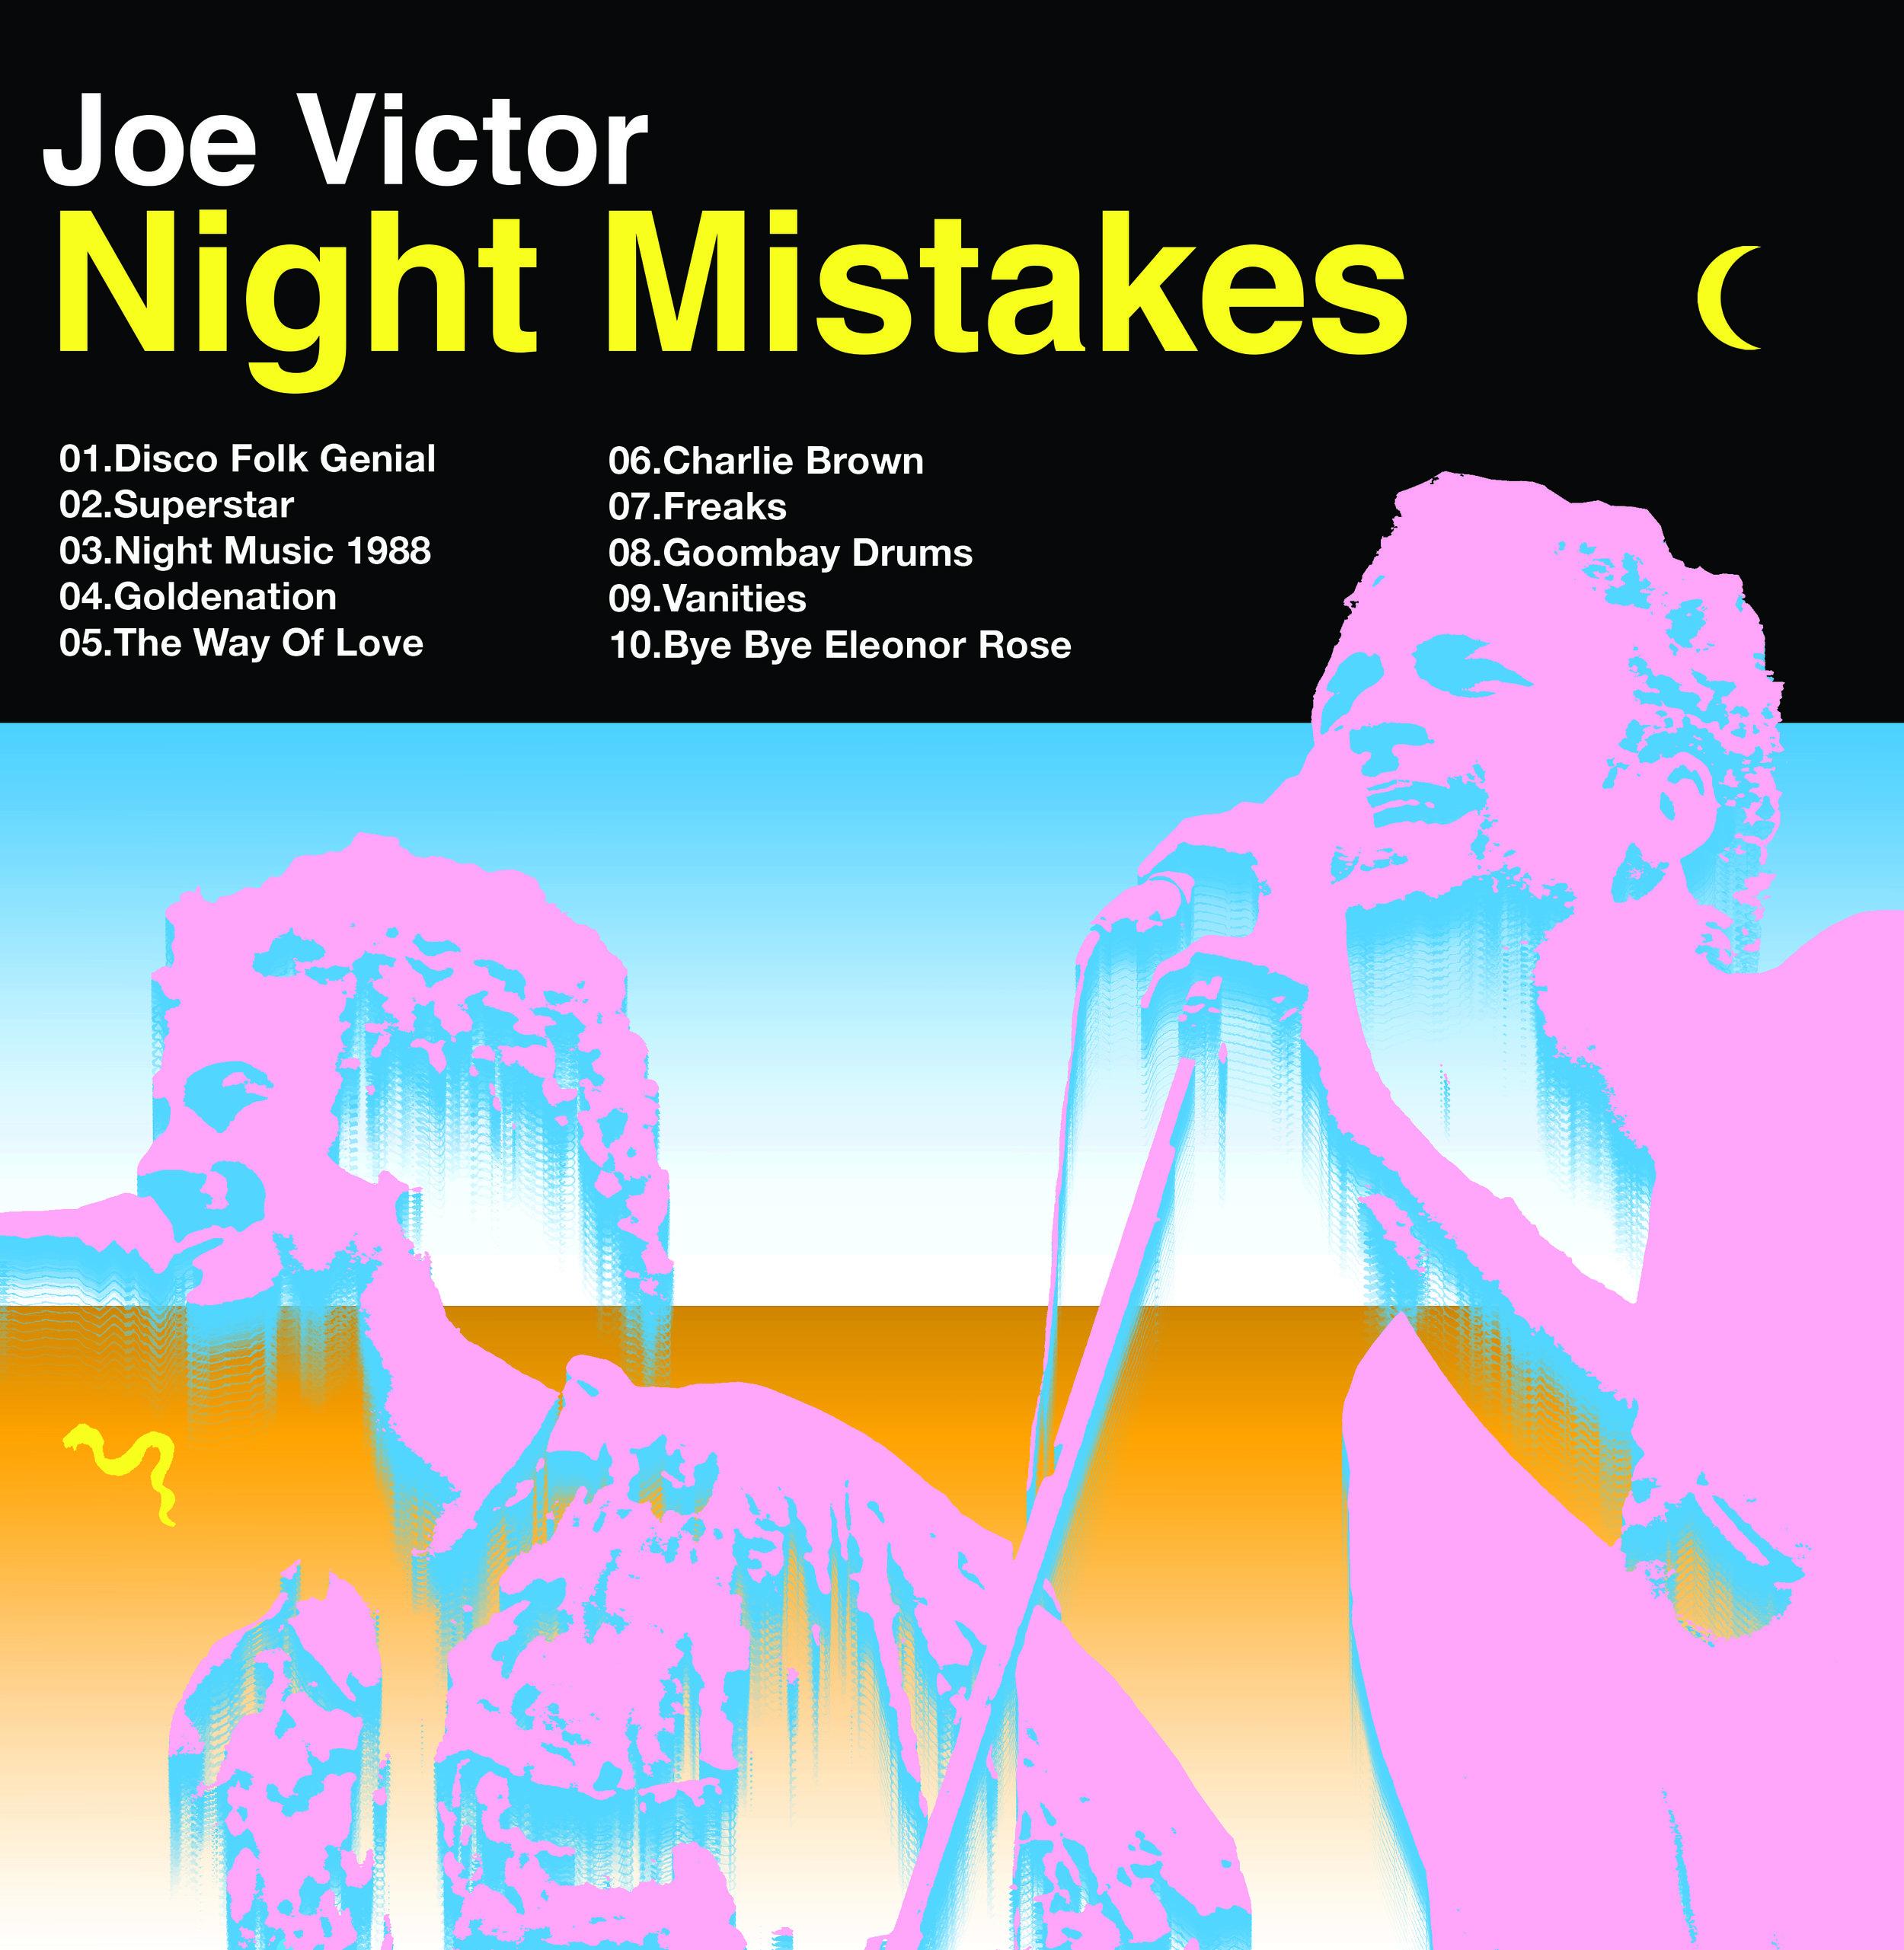 JV-Night Mistakes-Copertina.jpg